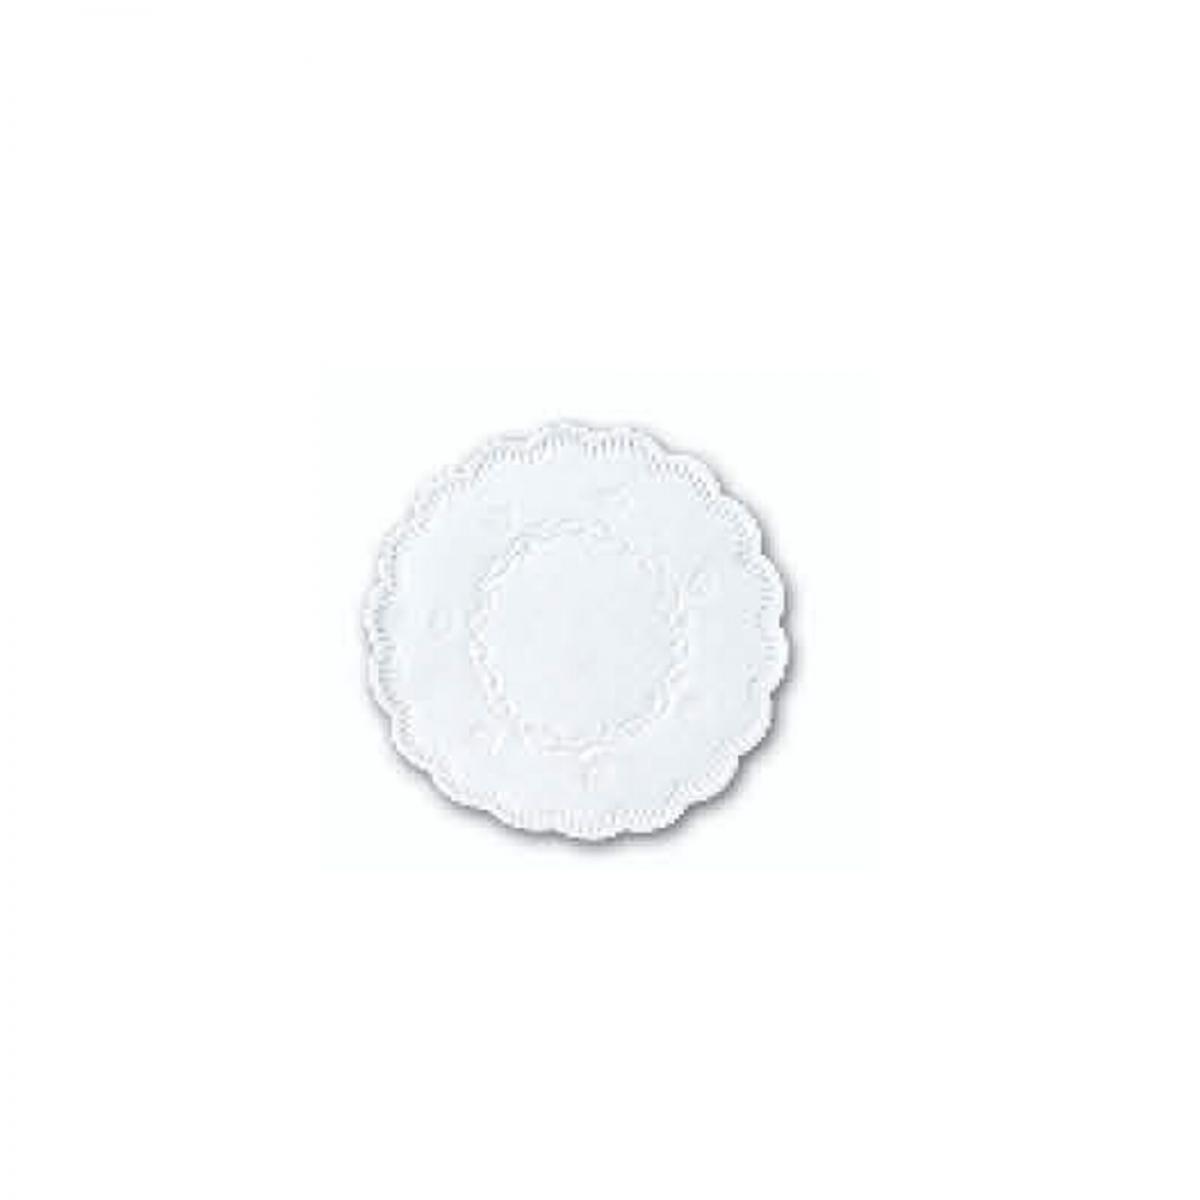 tissue coaster 48*25